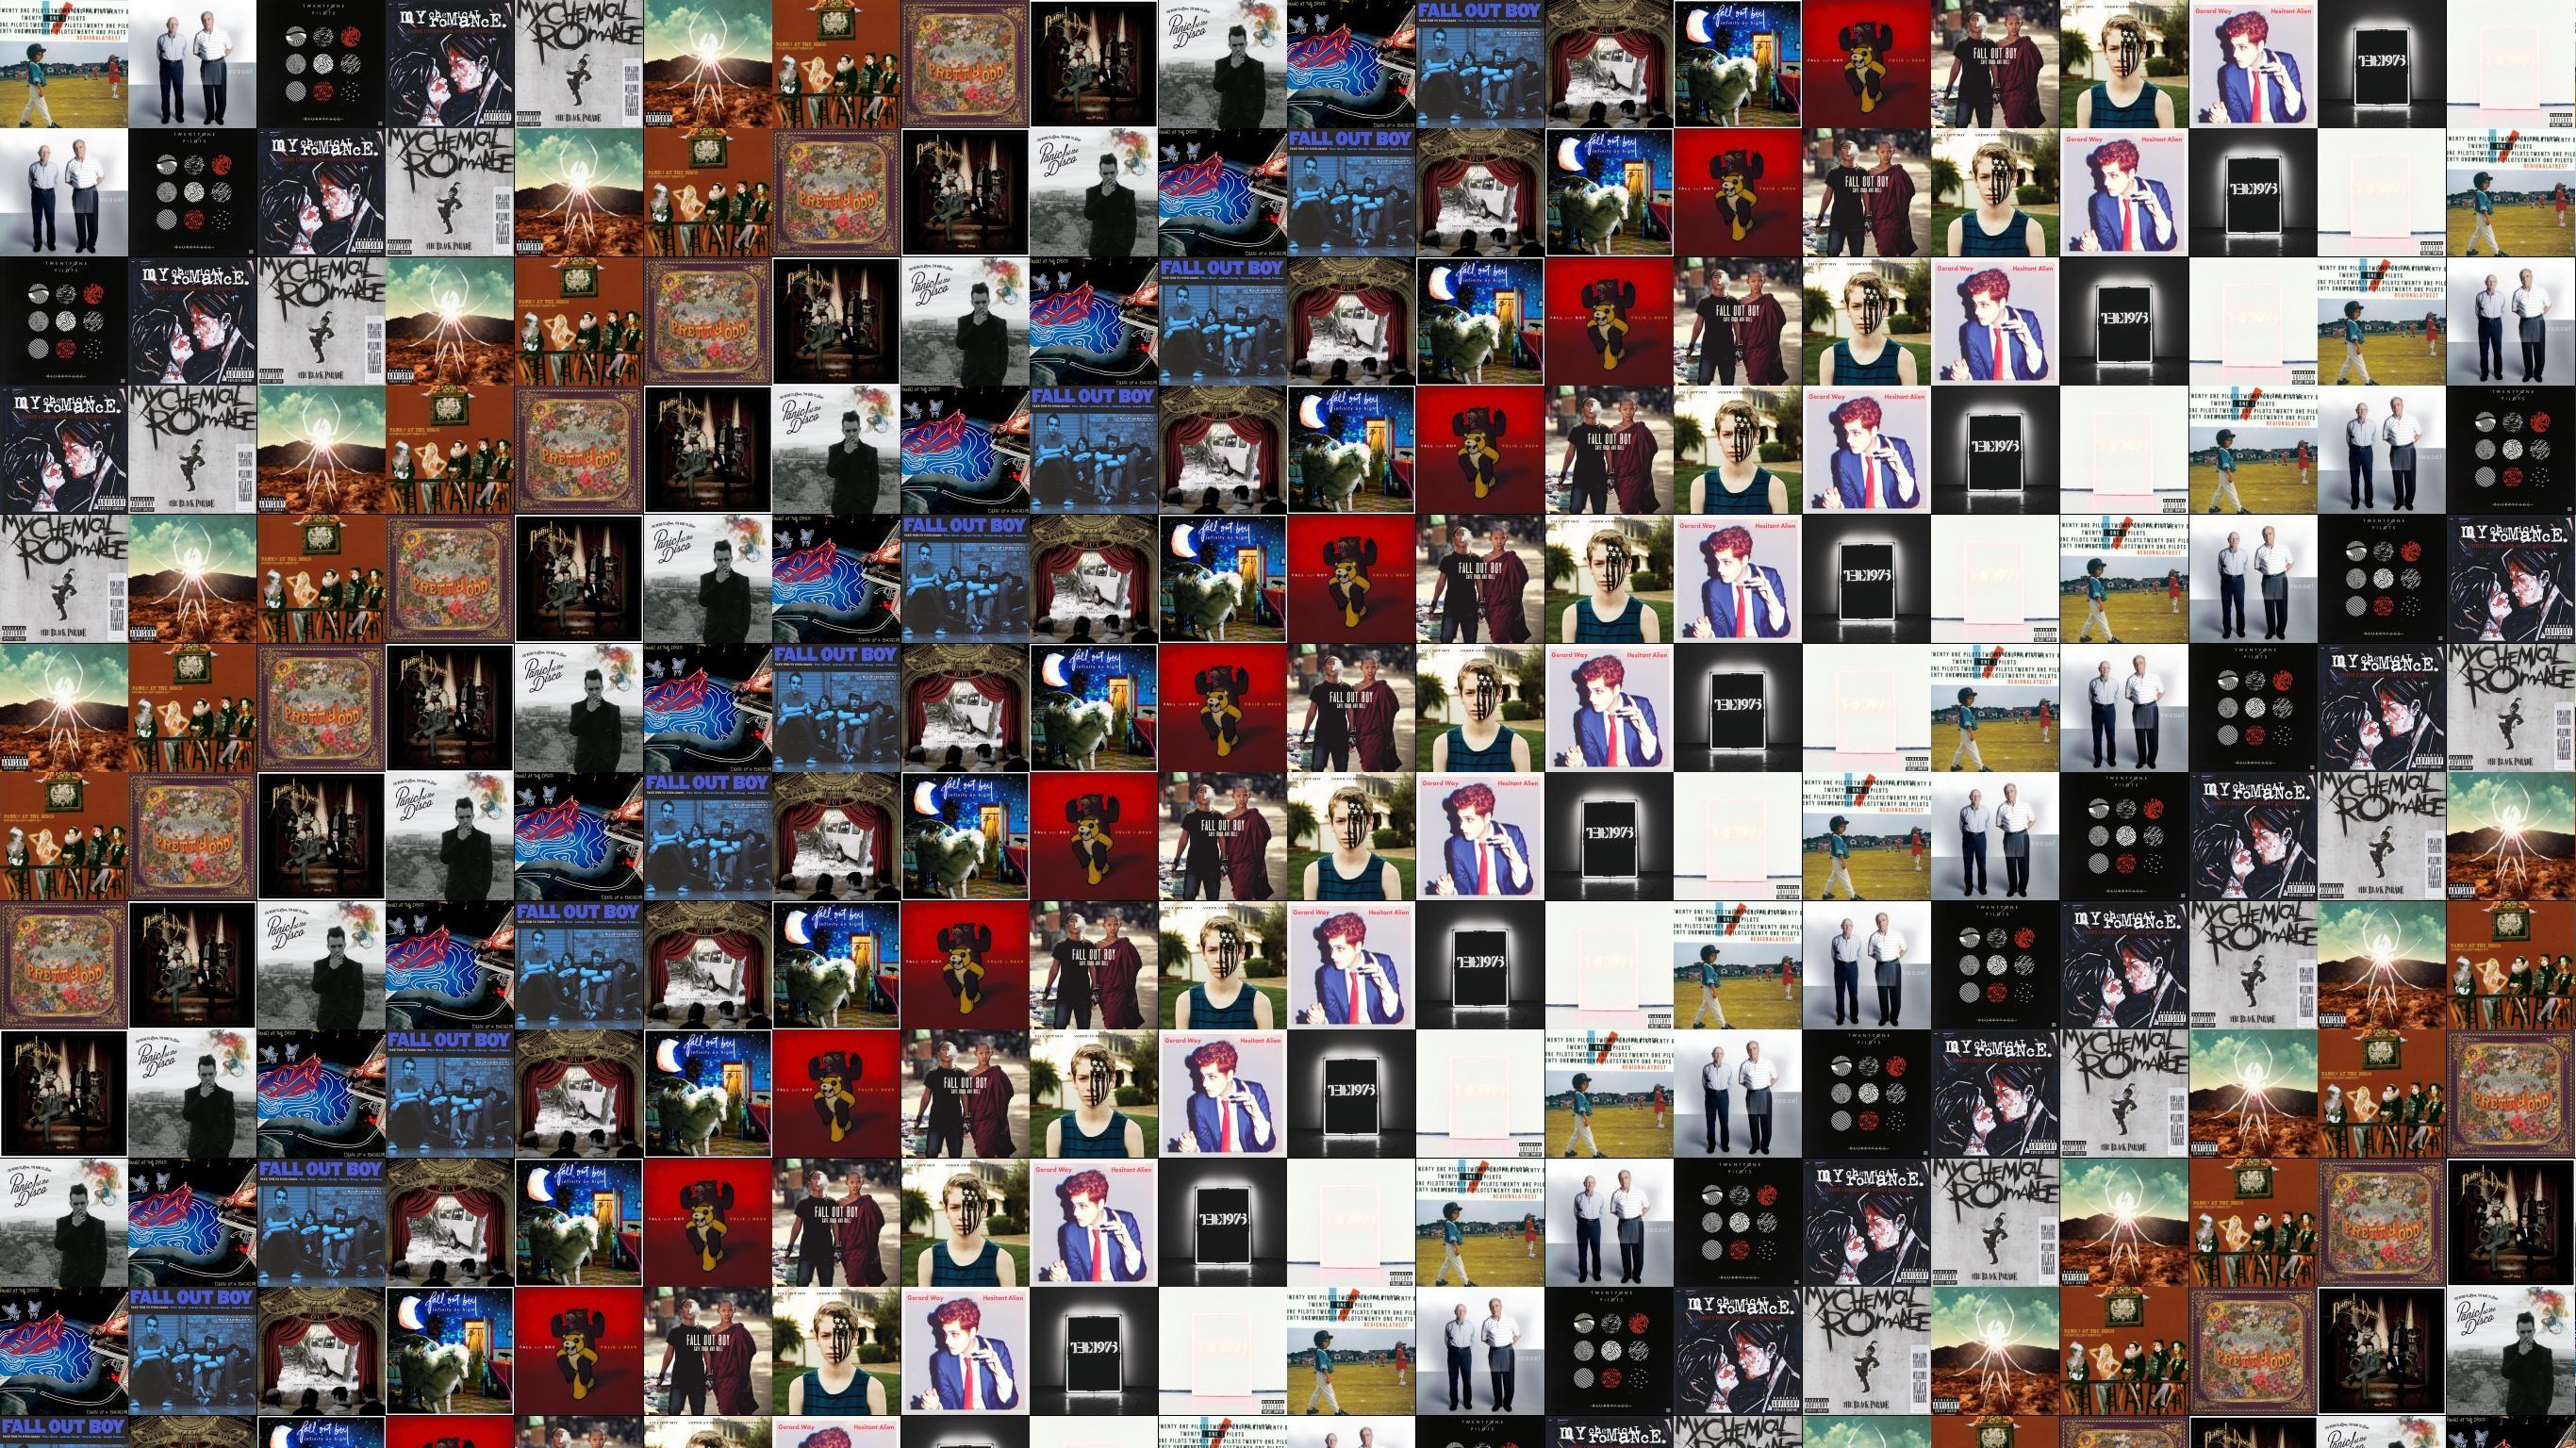 Fall Out Boy Album Wallpaper Twenty One Pilots Desktop Wallpaper 183 ① Download Free